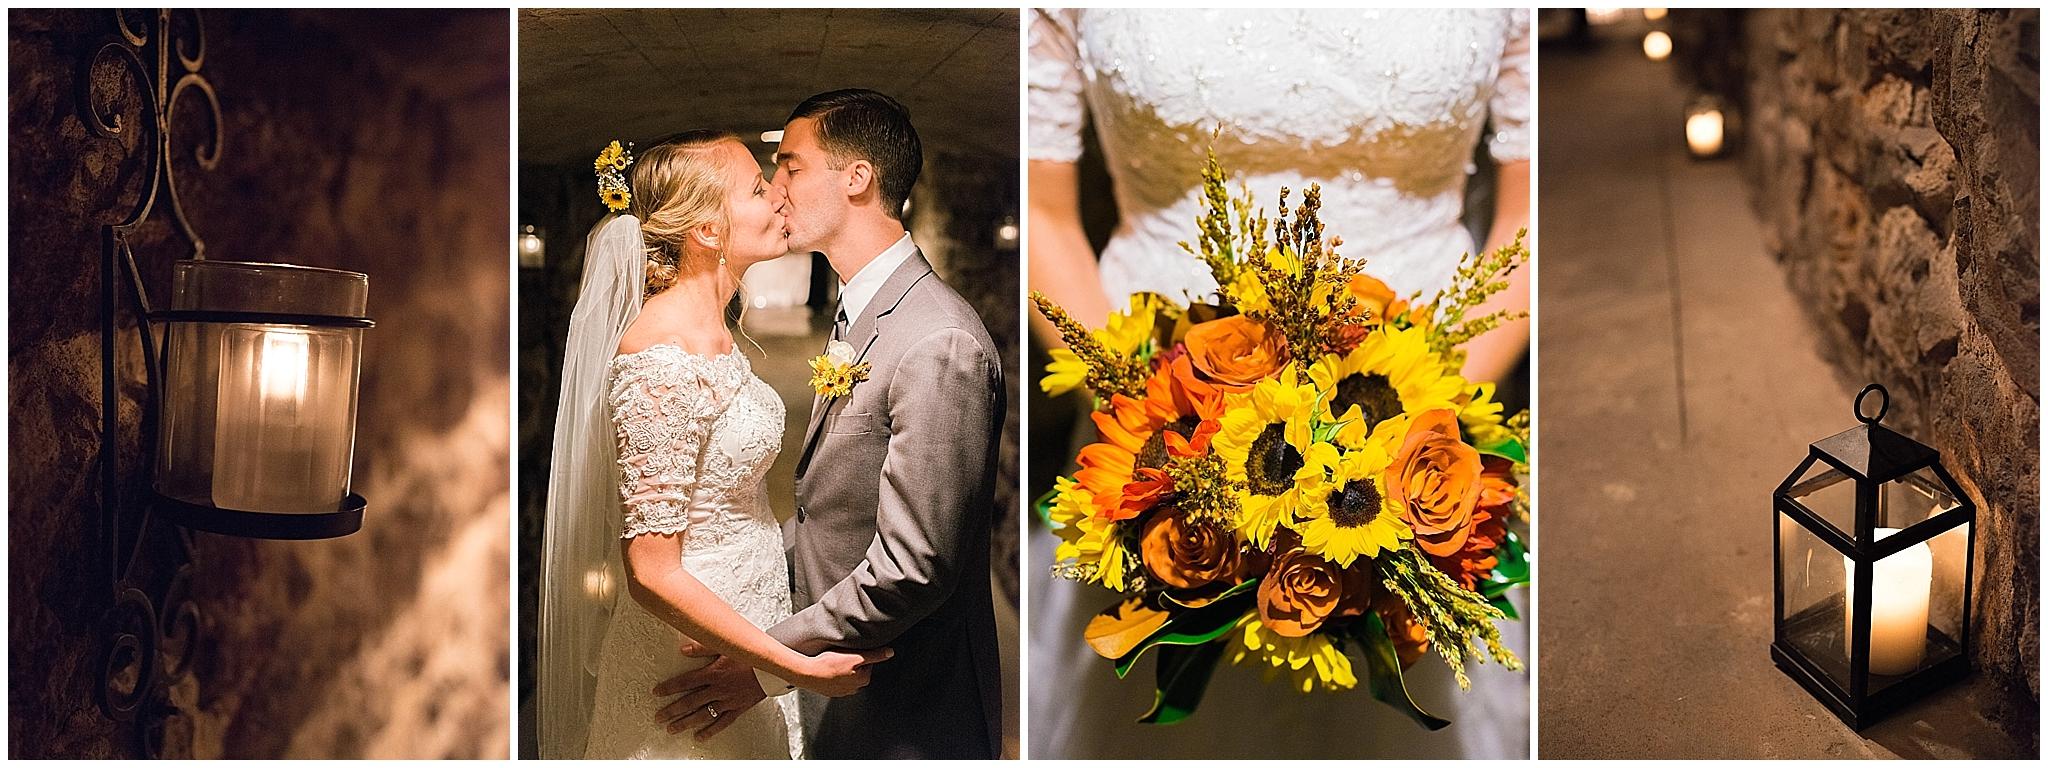 Biltmore_Wedding_Reception_Wine_Cellar_Asheville_Photographer-2.jpg